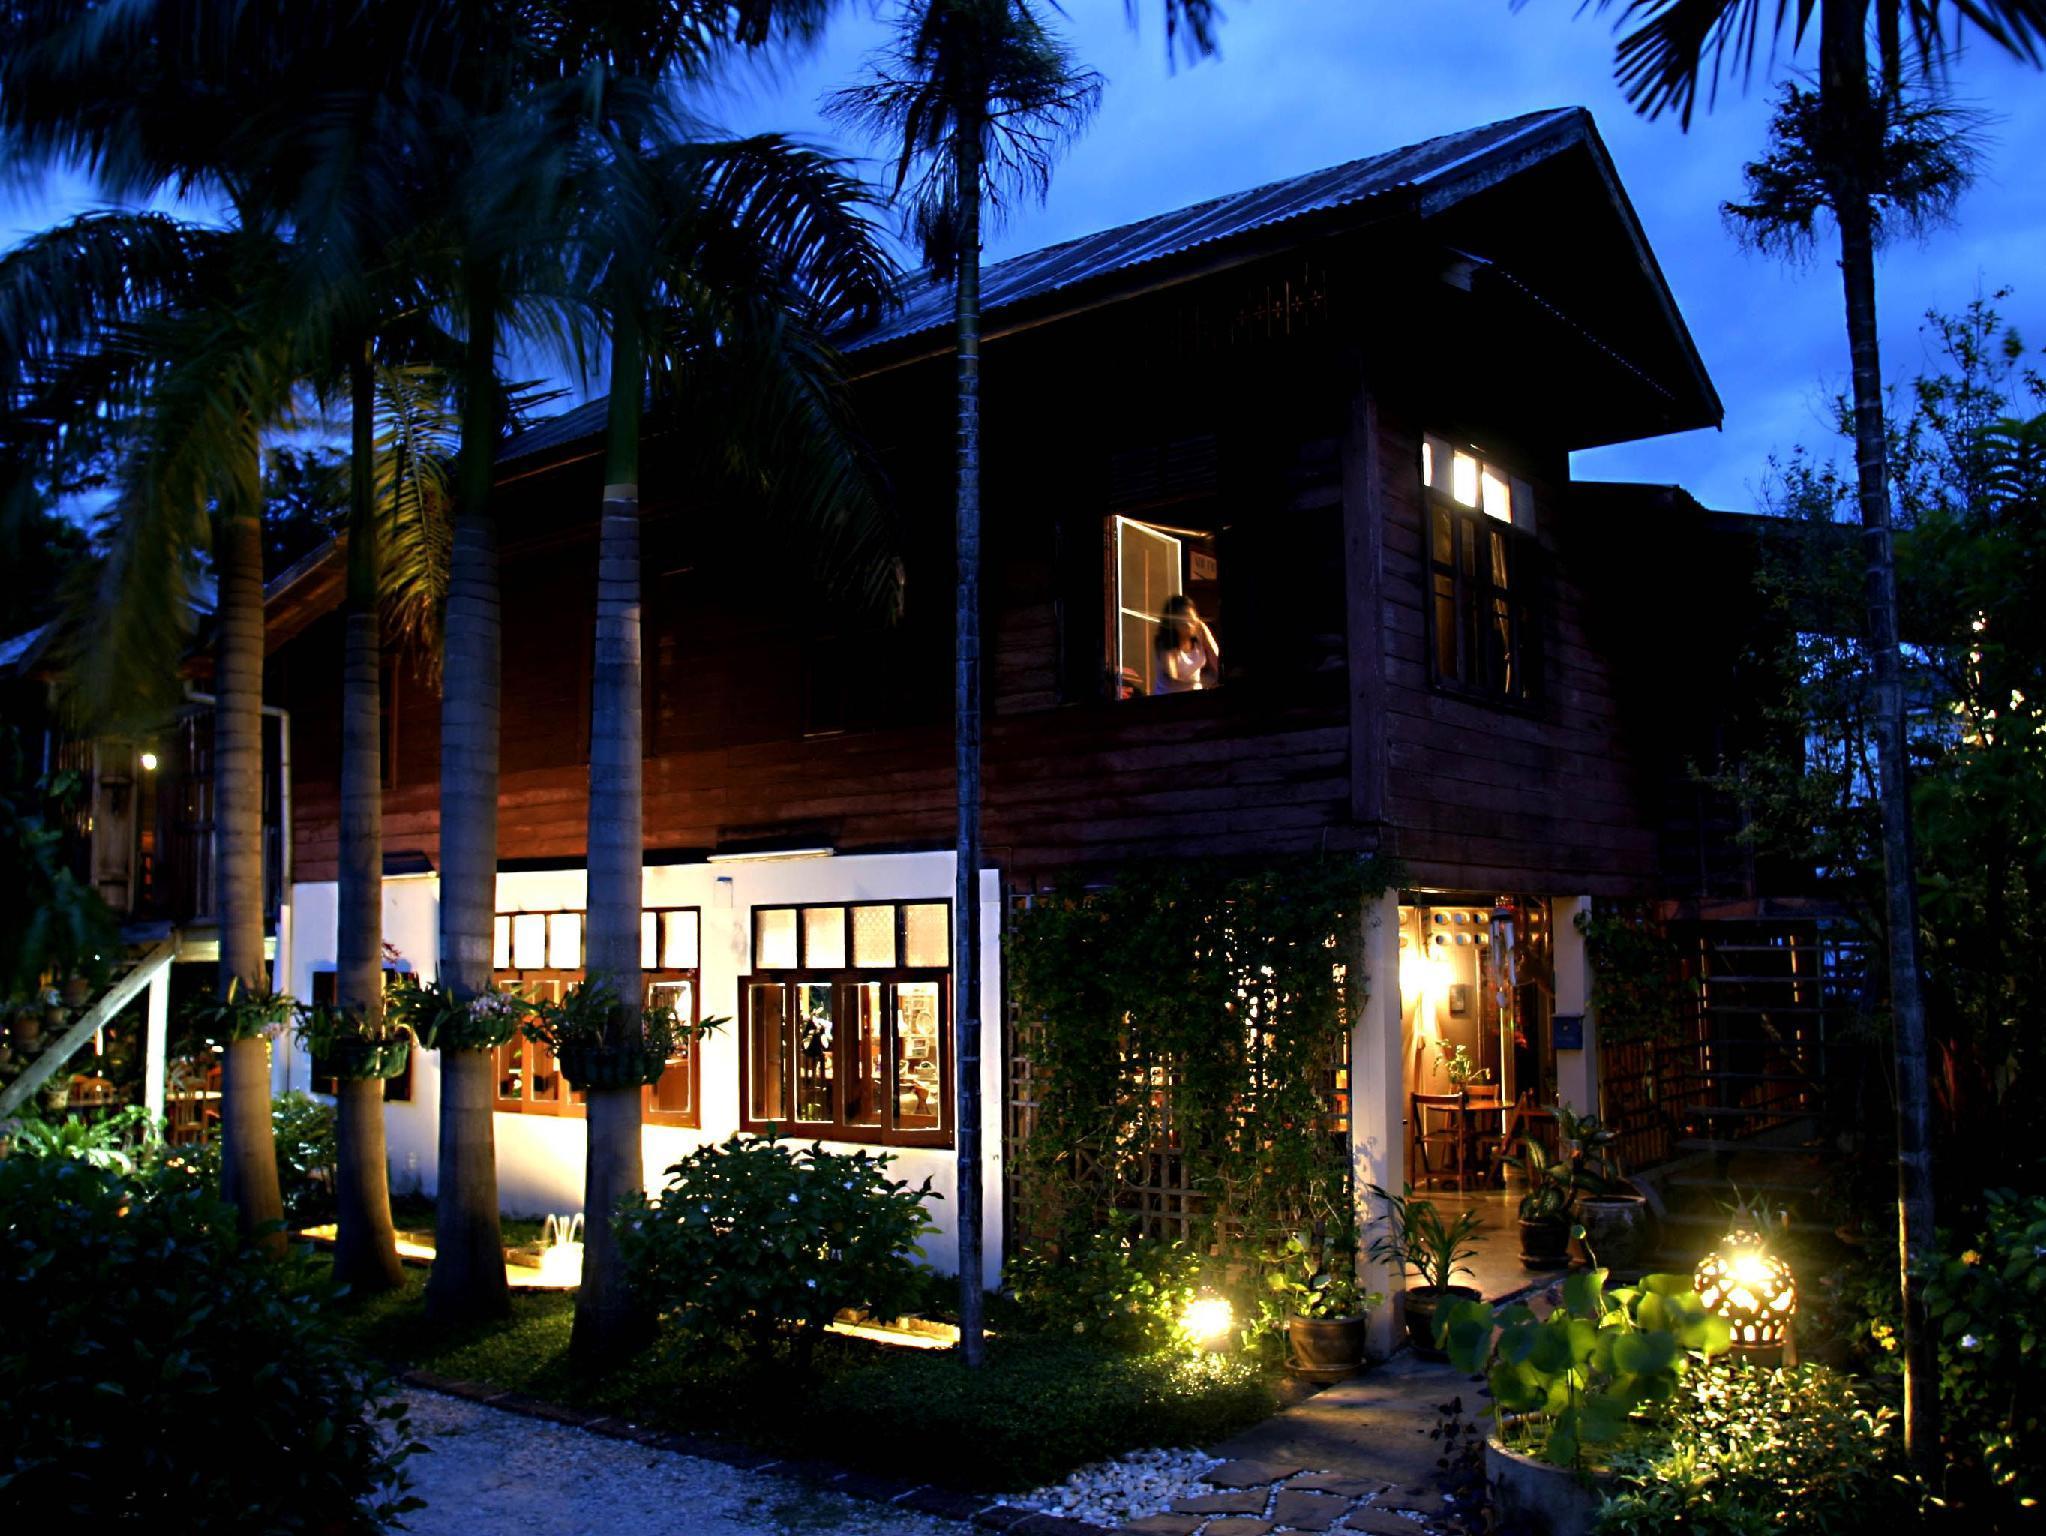 Lotus Village Hotel โรงแรมโลตัส วิลเลจ